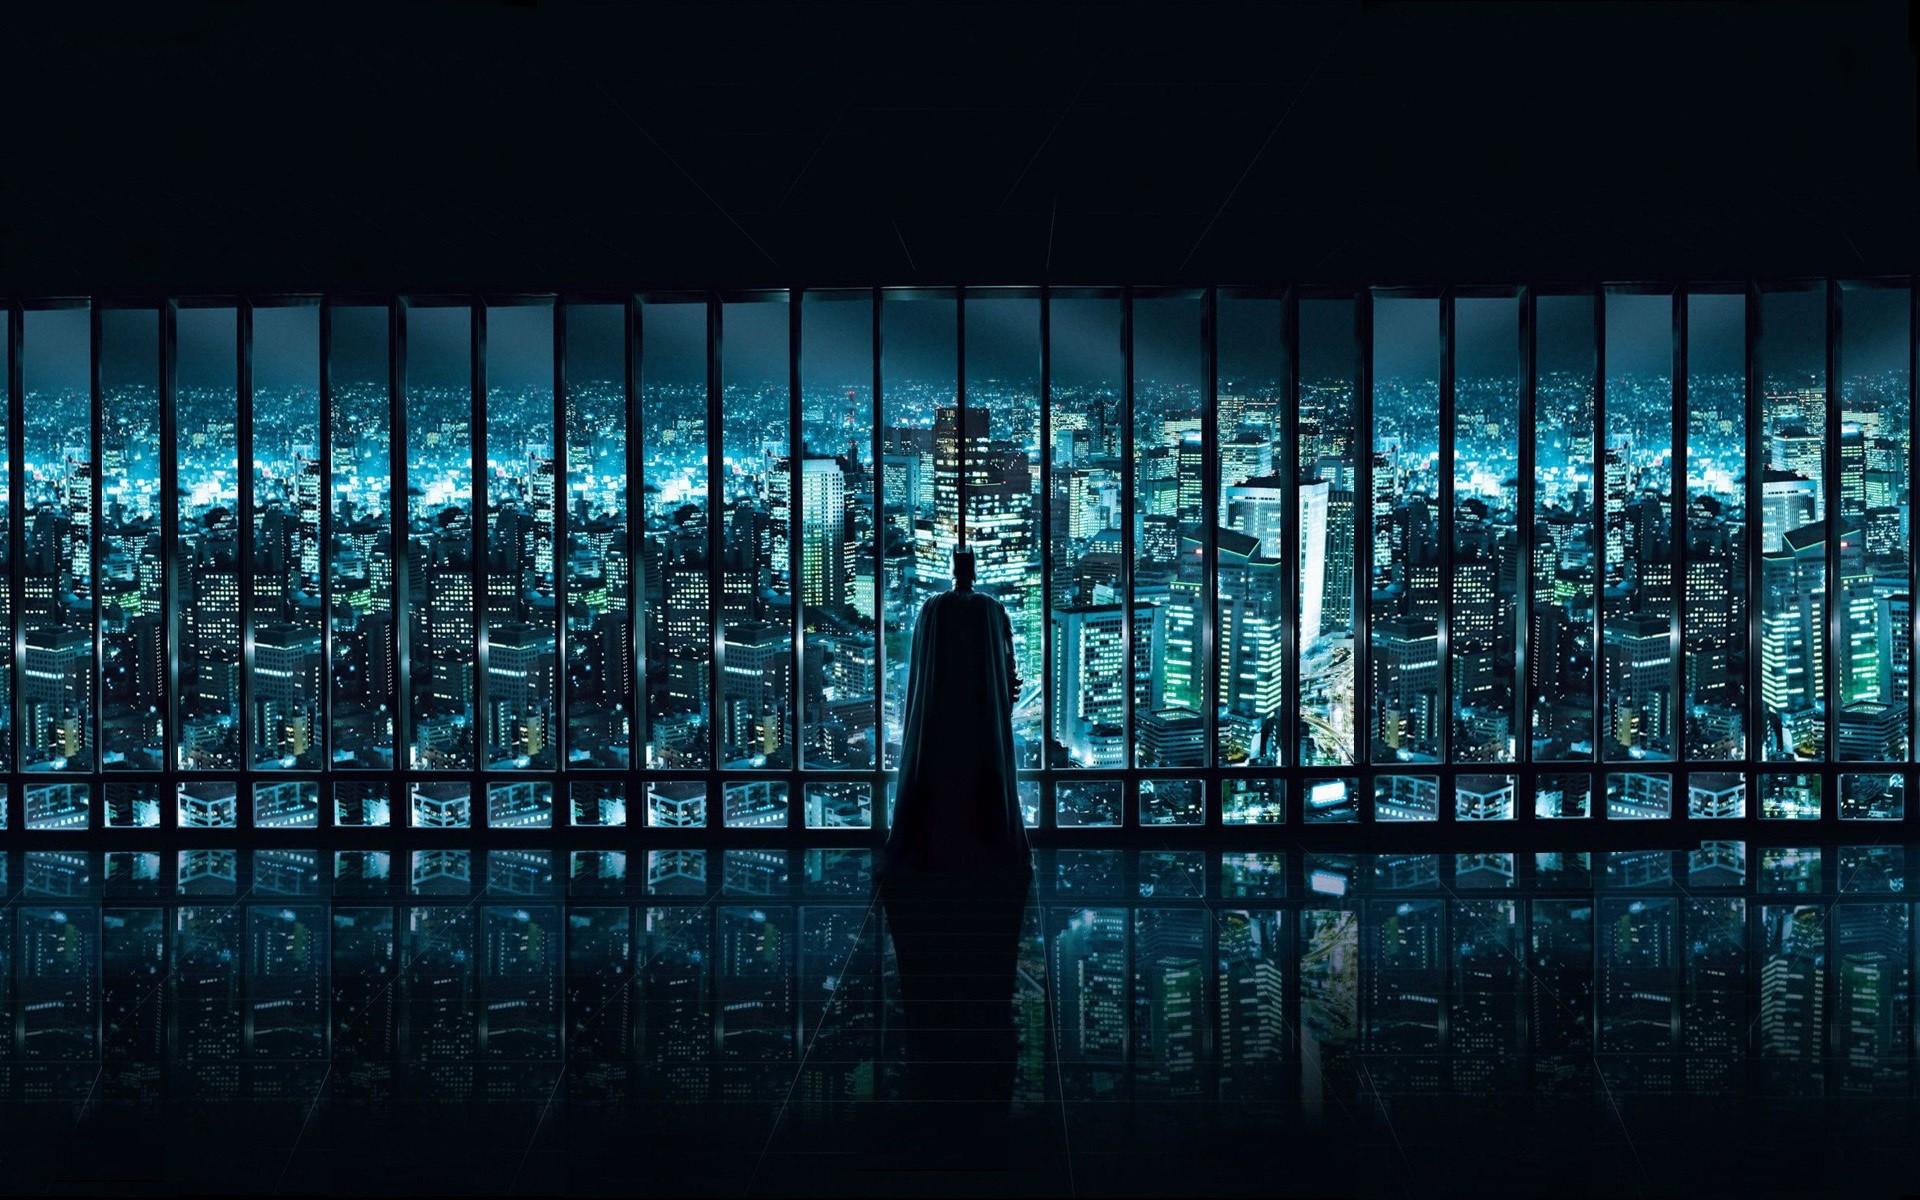 Batman desktop wallpaper widescreen wallpapersafari - Wallpapers sites list ...